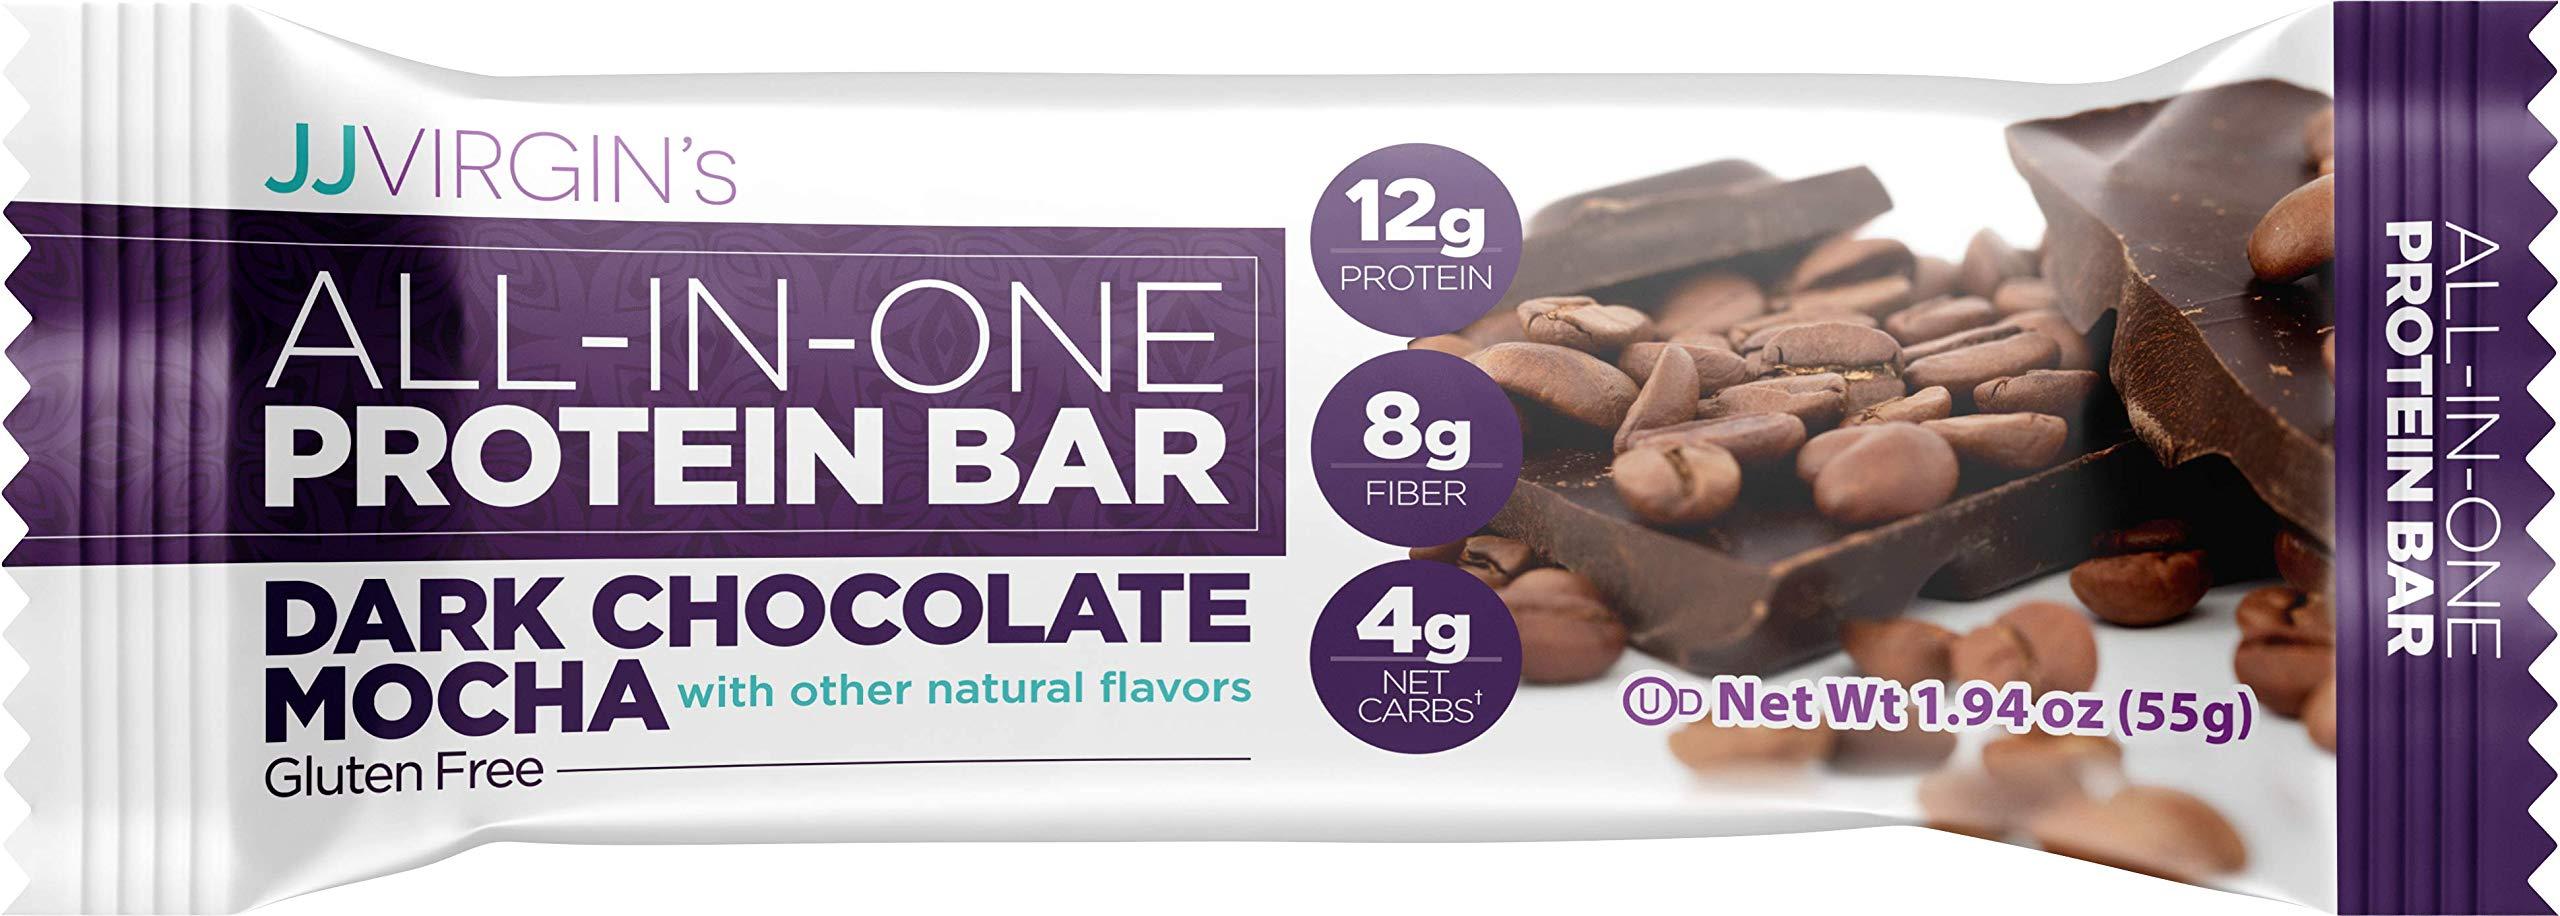 JJ Virgin All-in-One Protein Bar in Dark Chocolate Mocha - 12 Grams of Protein, 8 Grams of Fiber + MCT Oils (Box of 12) by JJ VIRGIN